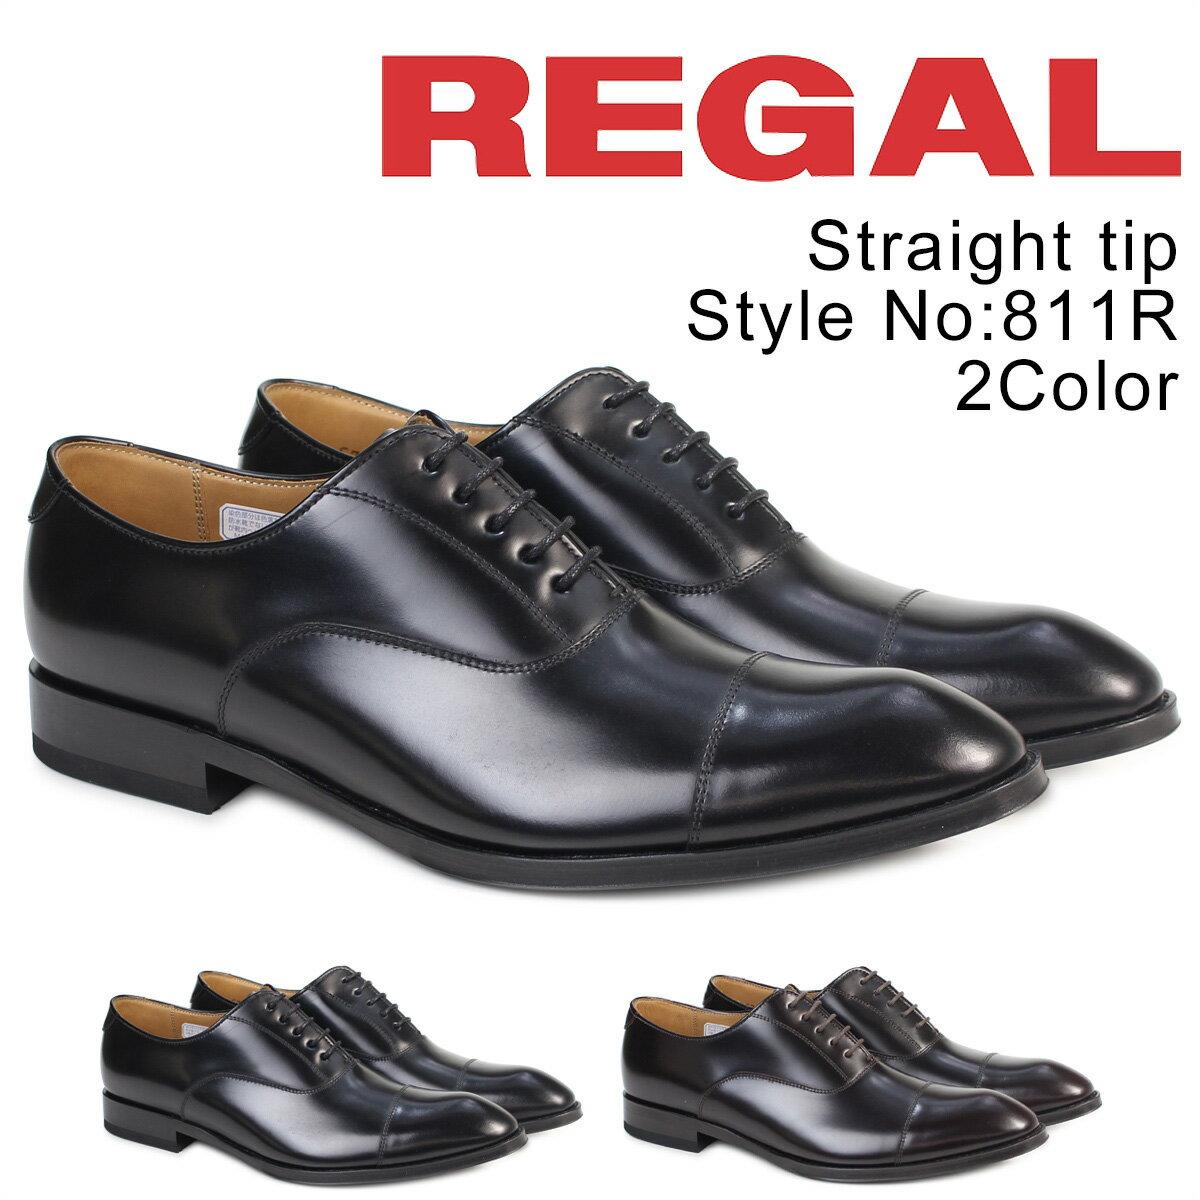 REGAL 811R AL 靴 メンズ リーガル ビジネスシューズ ストレートチップ